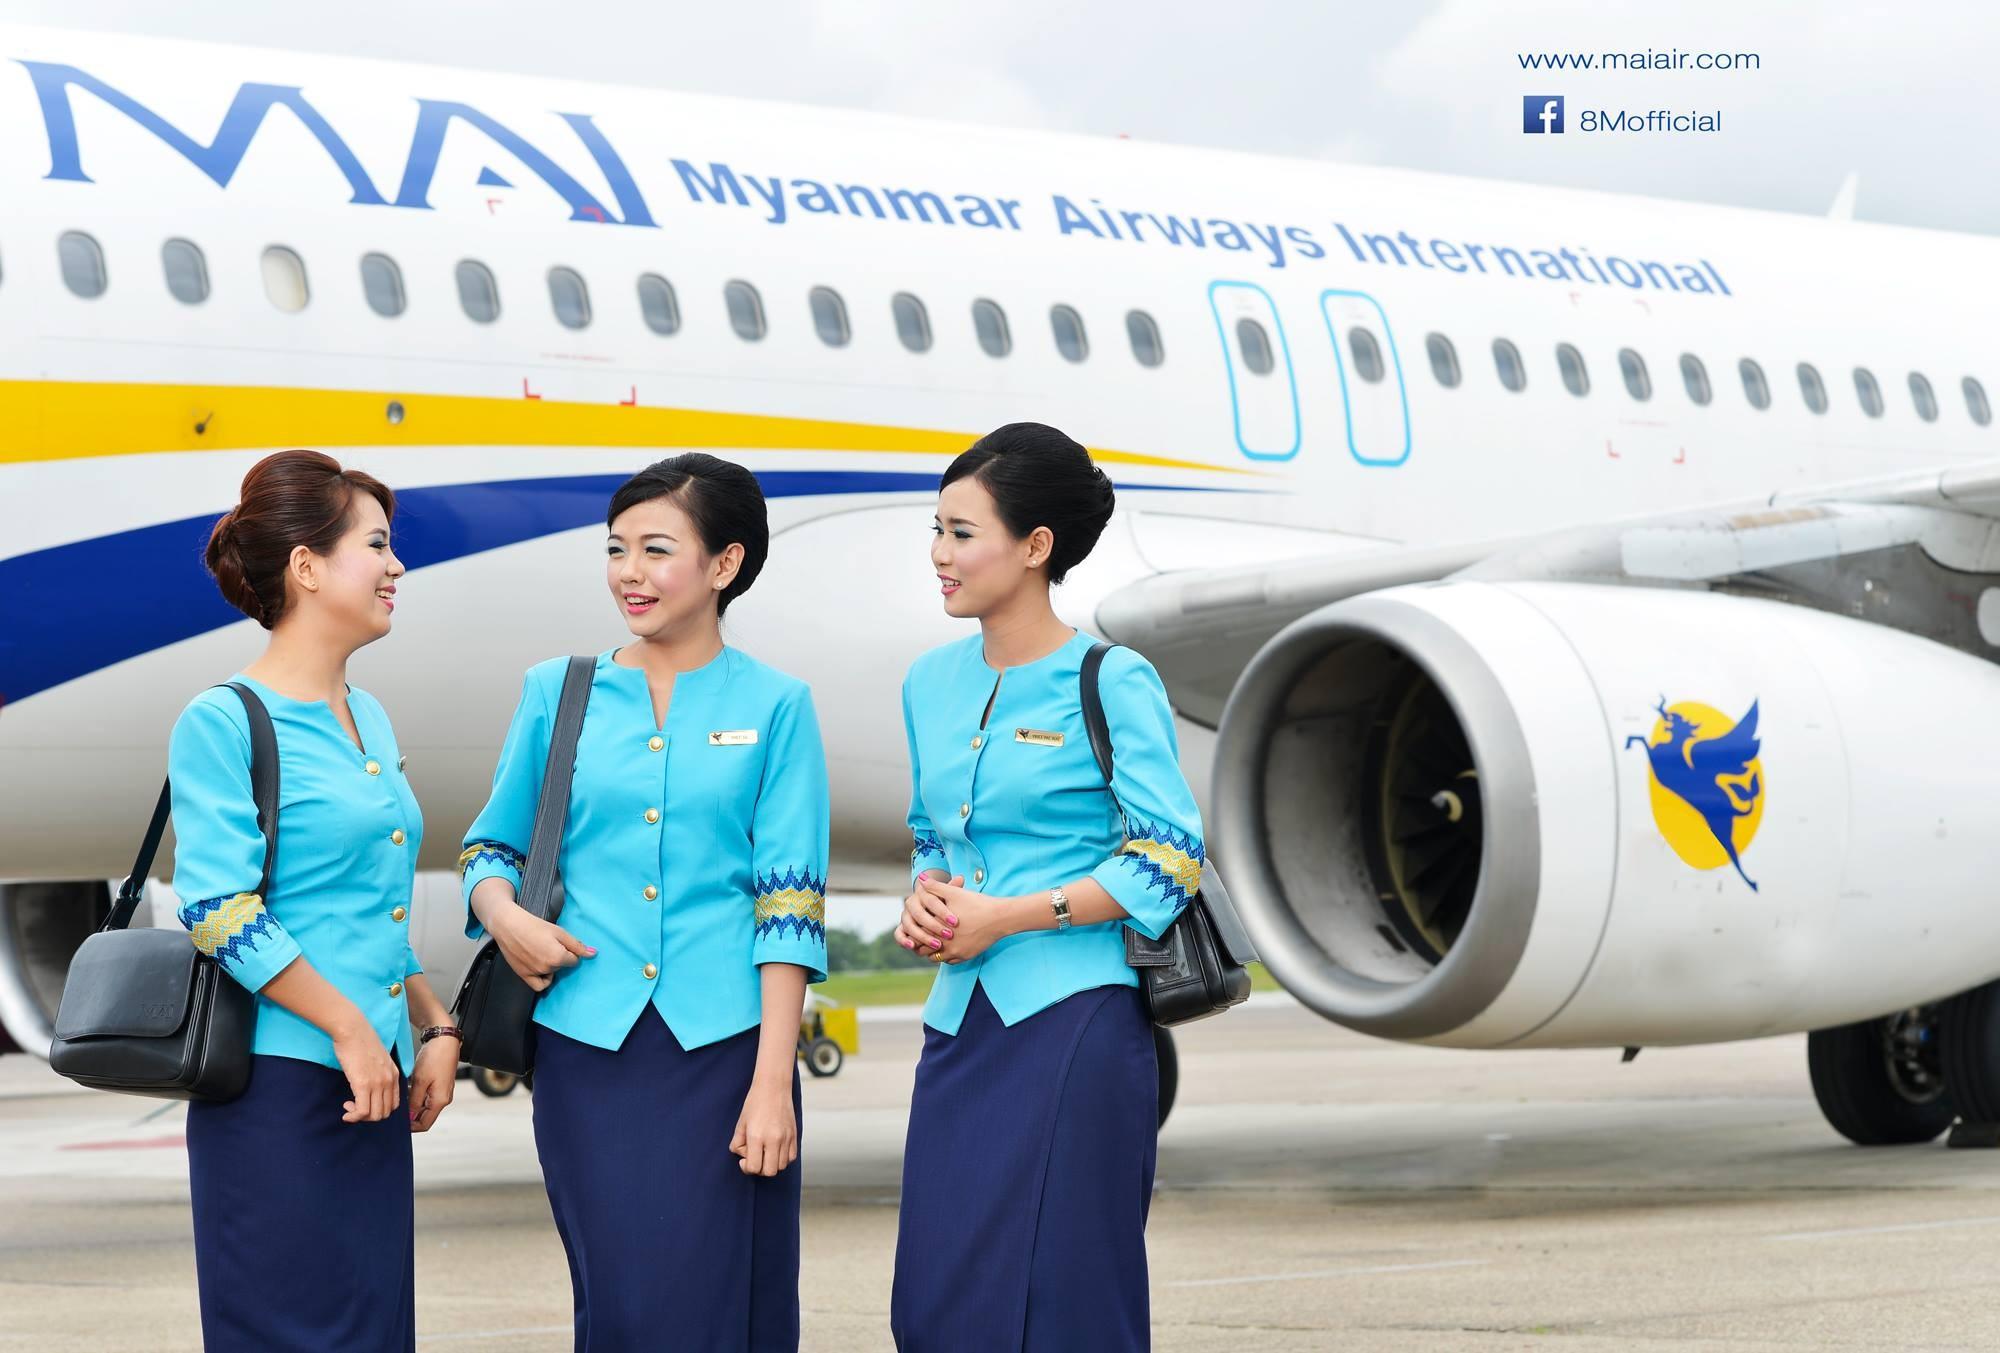 Myanmar Airways International Company Limited | LinkedIn